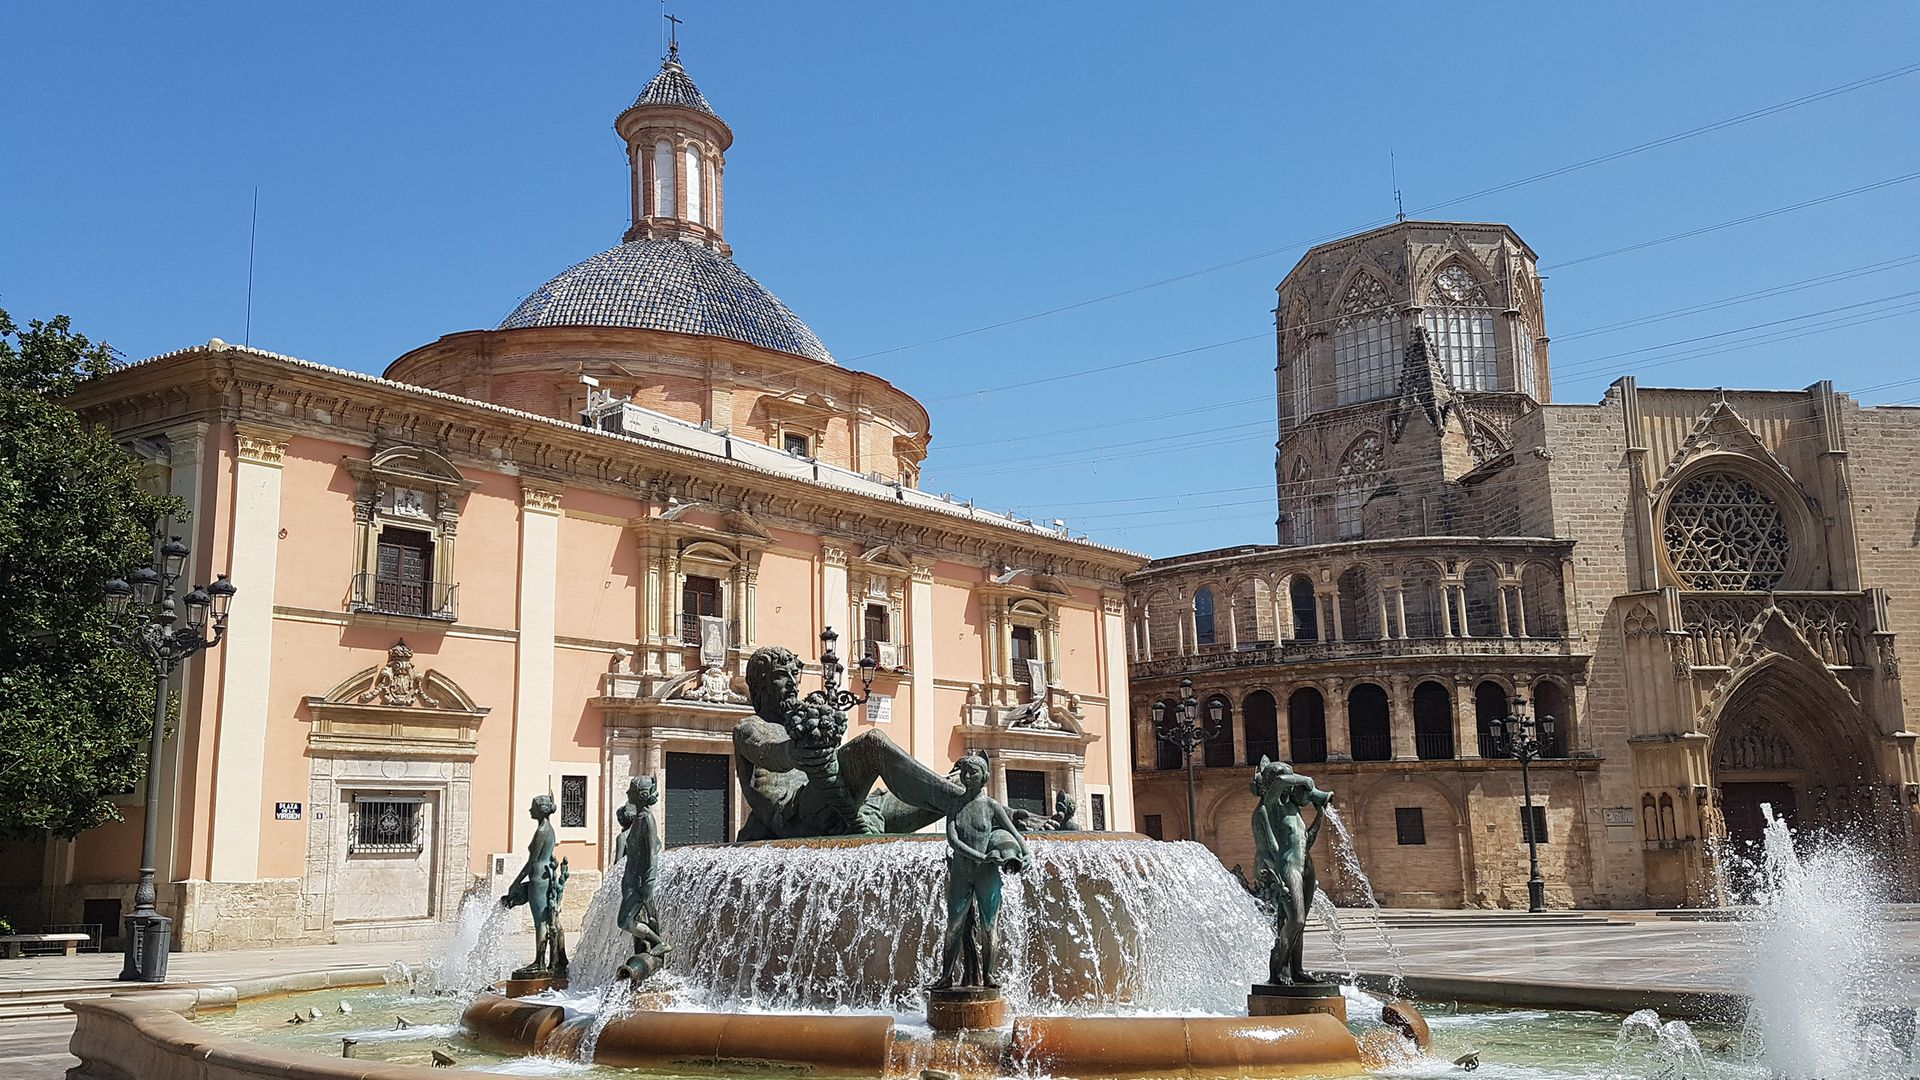 Valencia history, culture and art